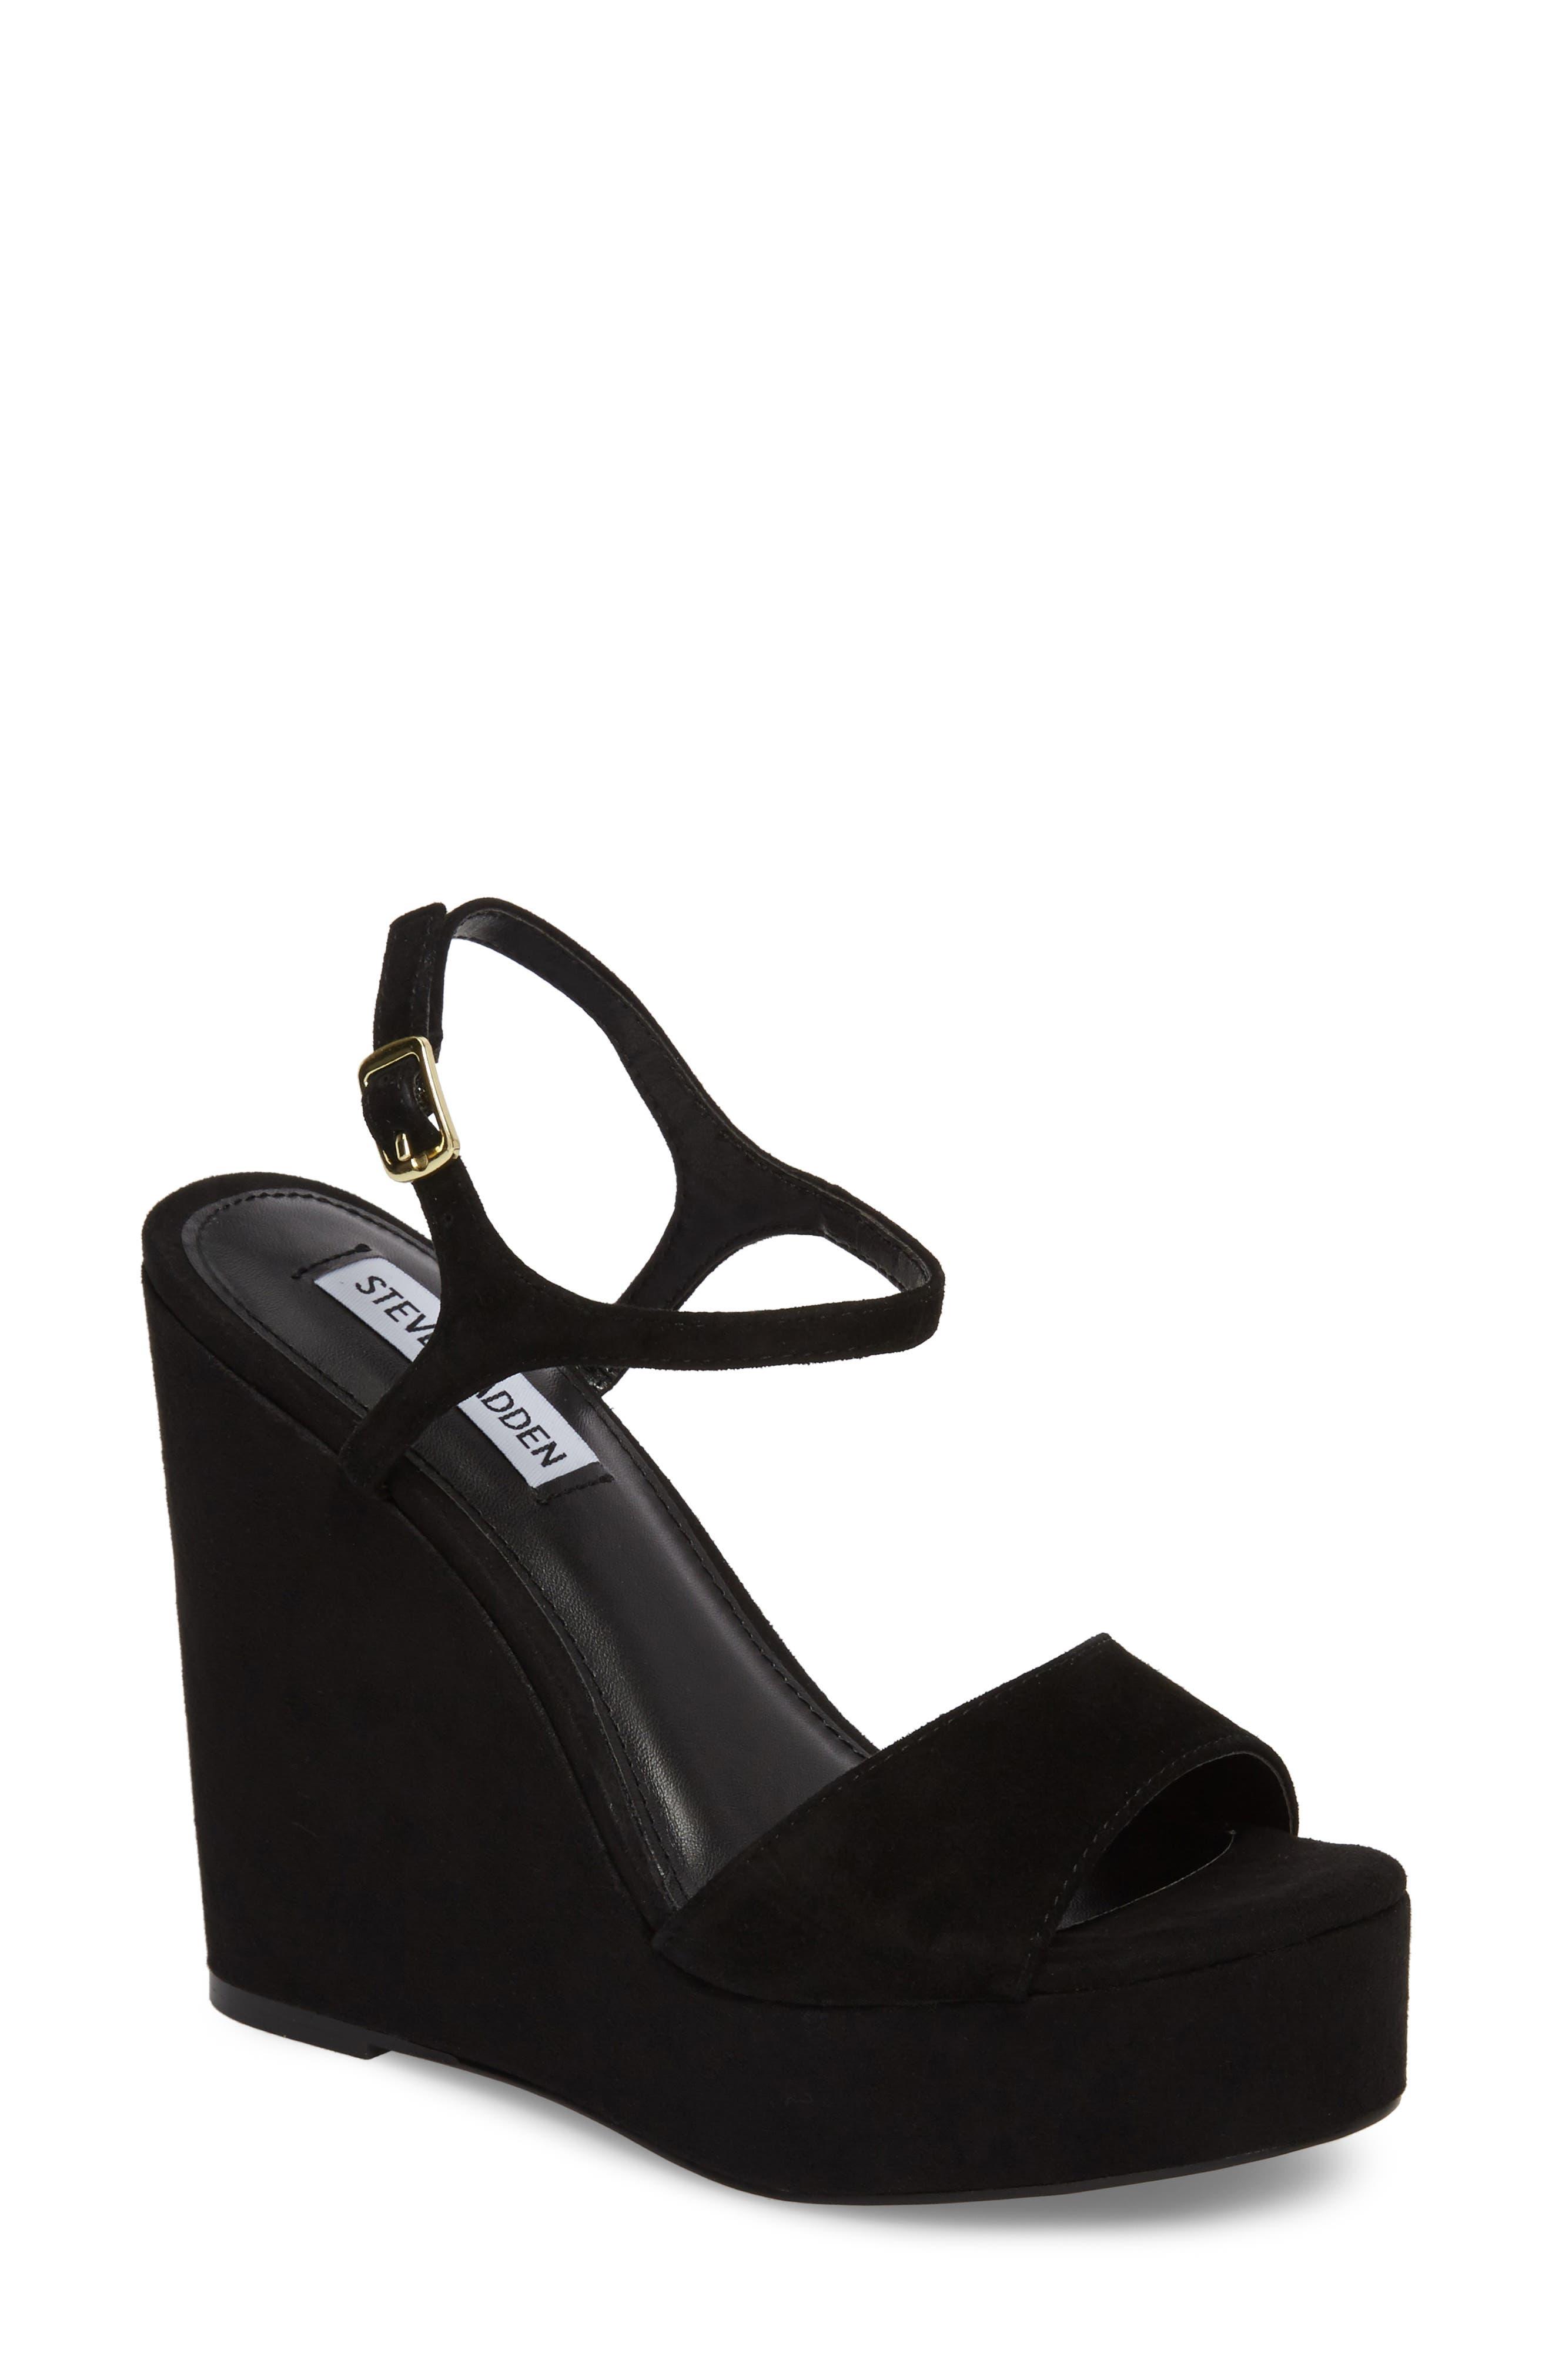 Truce Wedge Sandal,                             Main thumbnail 1, color,                             Black Suede